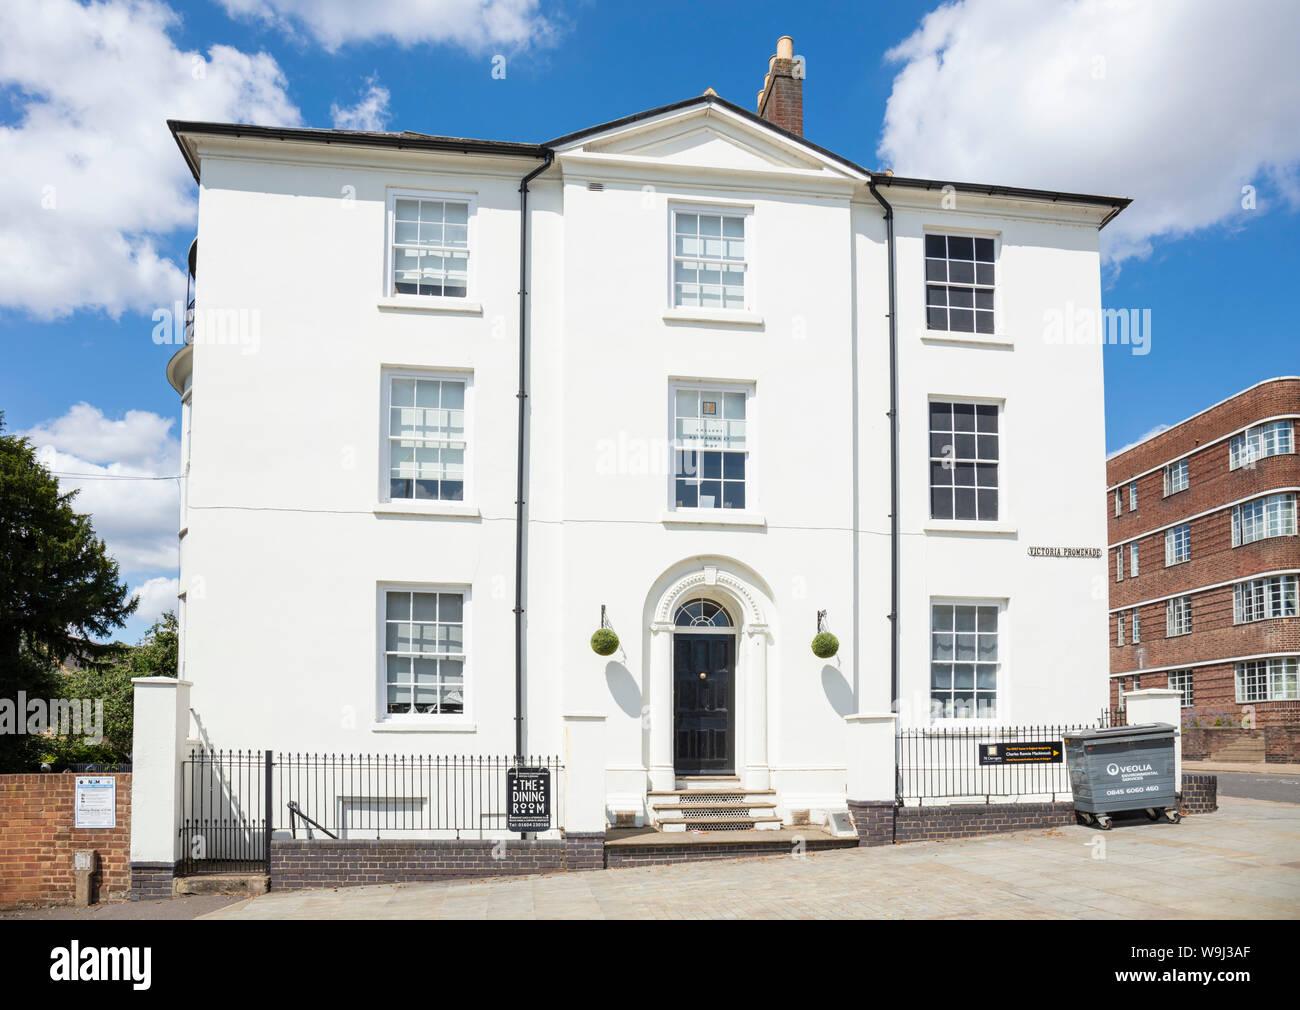 Art Deco House Northampton England High Resolution Stock Photography And Images Alamy